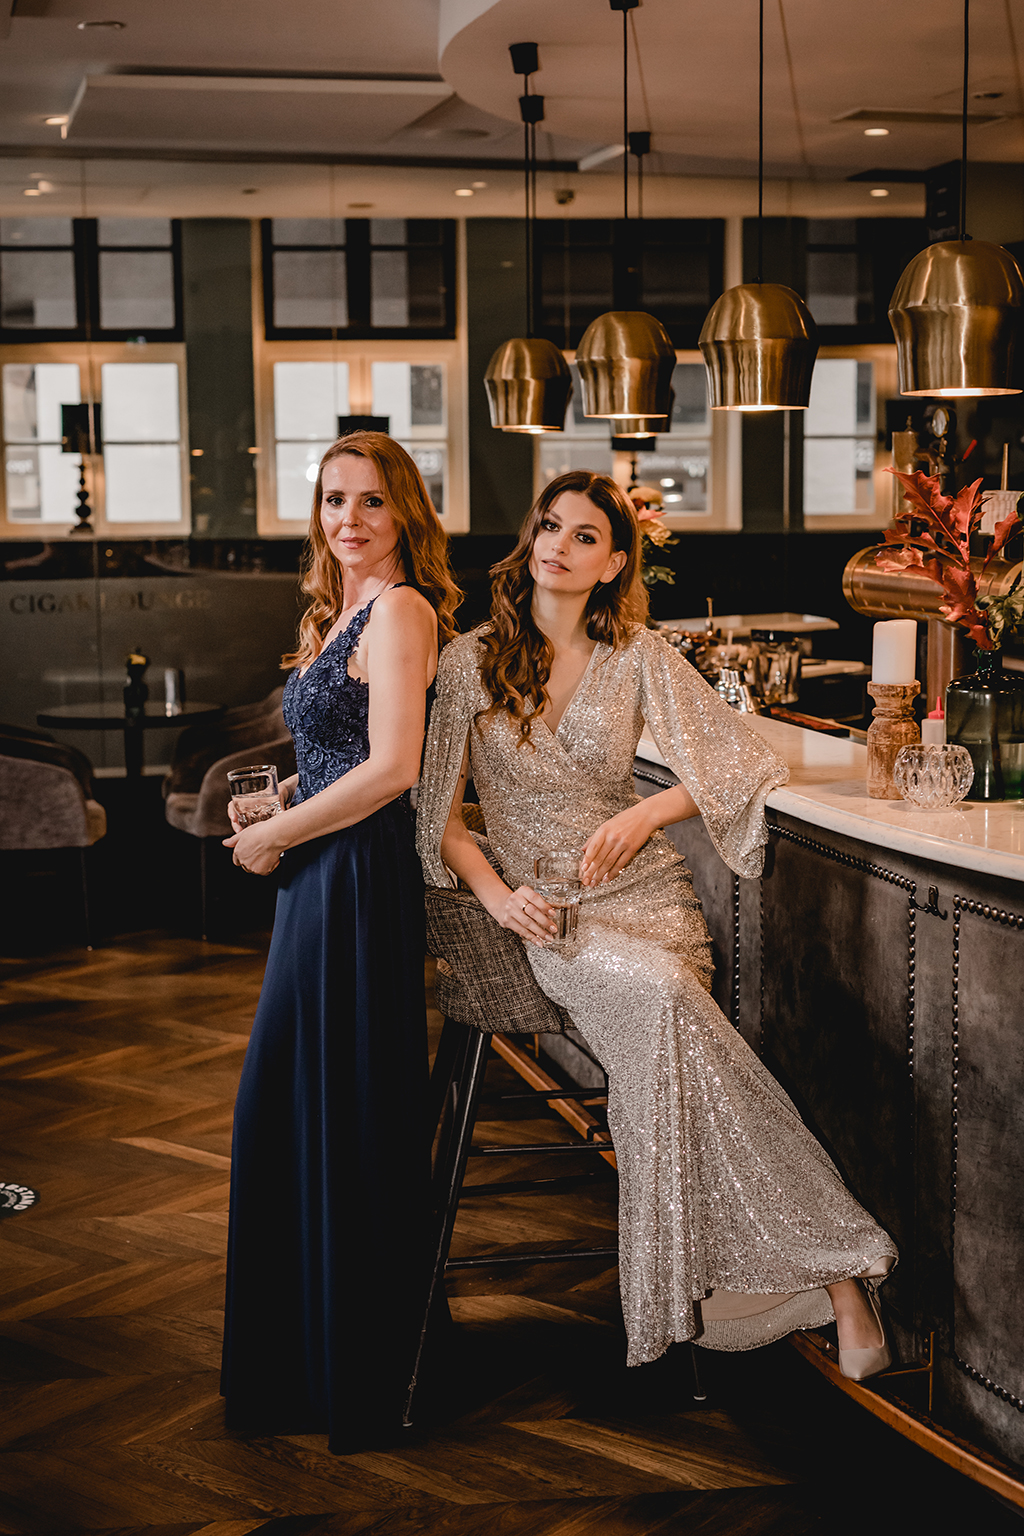 Abendkleider mit funkelnden Pailletten - Festmode - Feelings Braut & Festmode